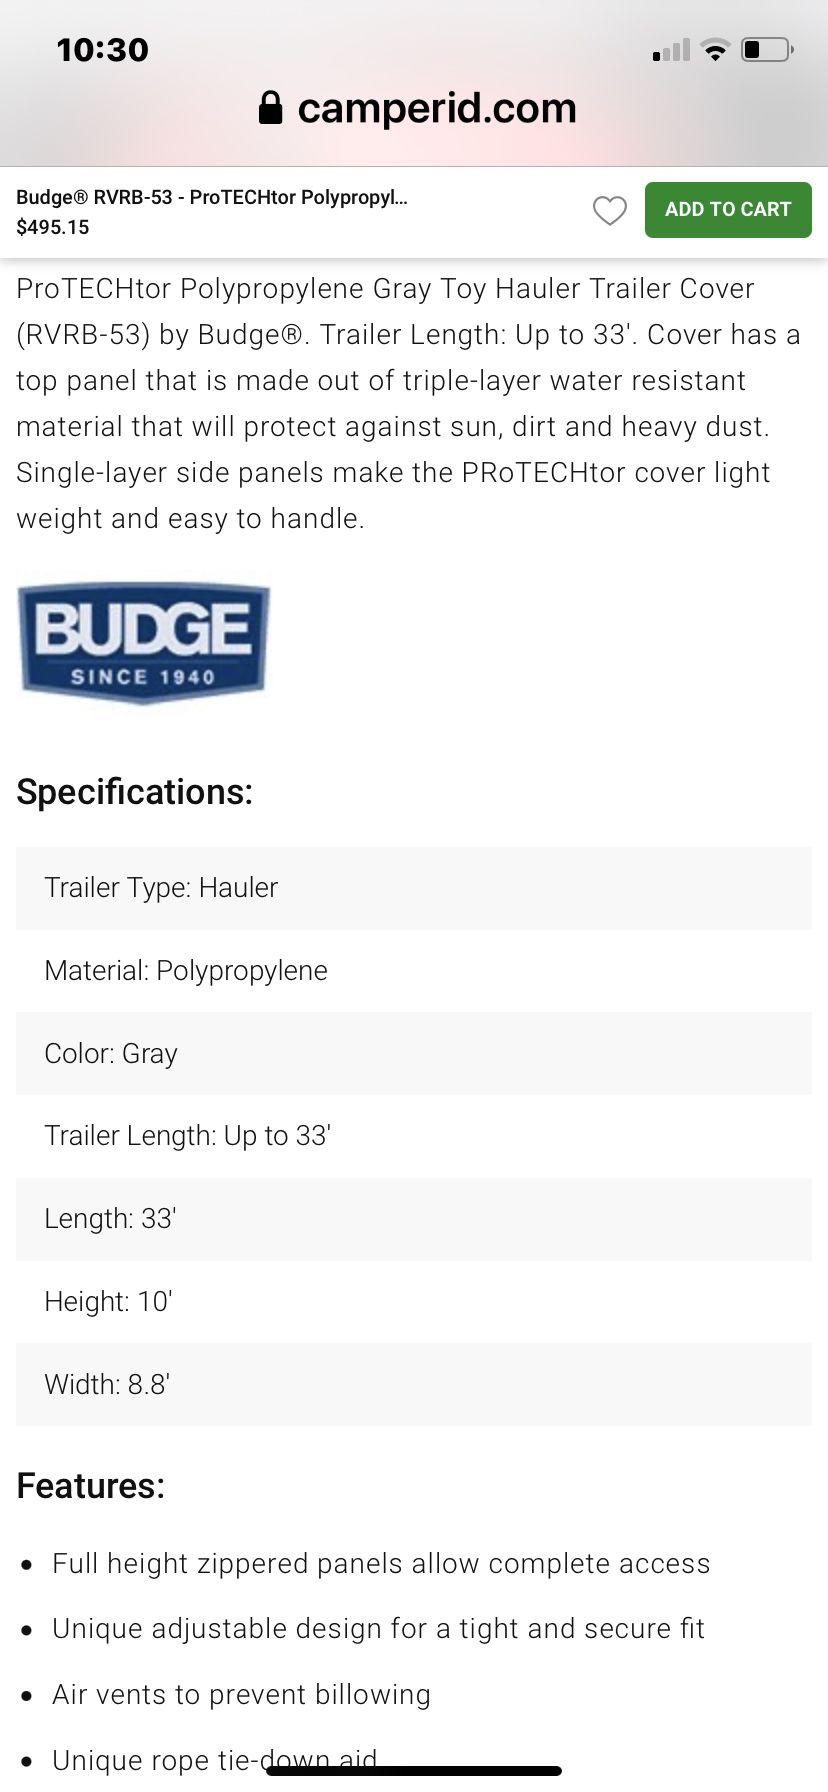 Budge Toy Hauler Cover 33' #RVRB-53